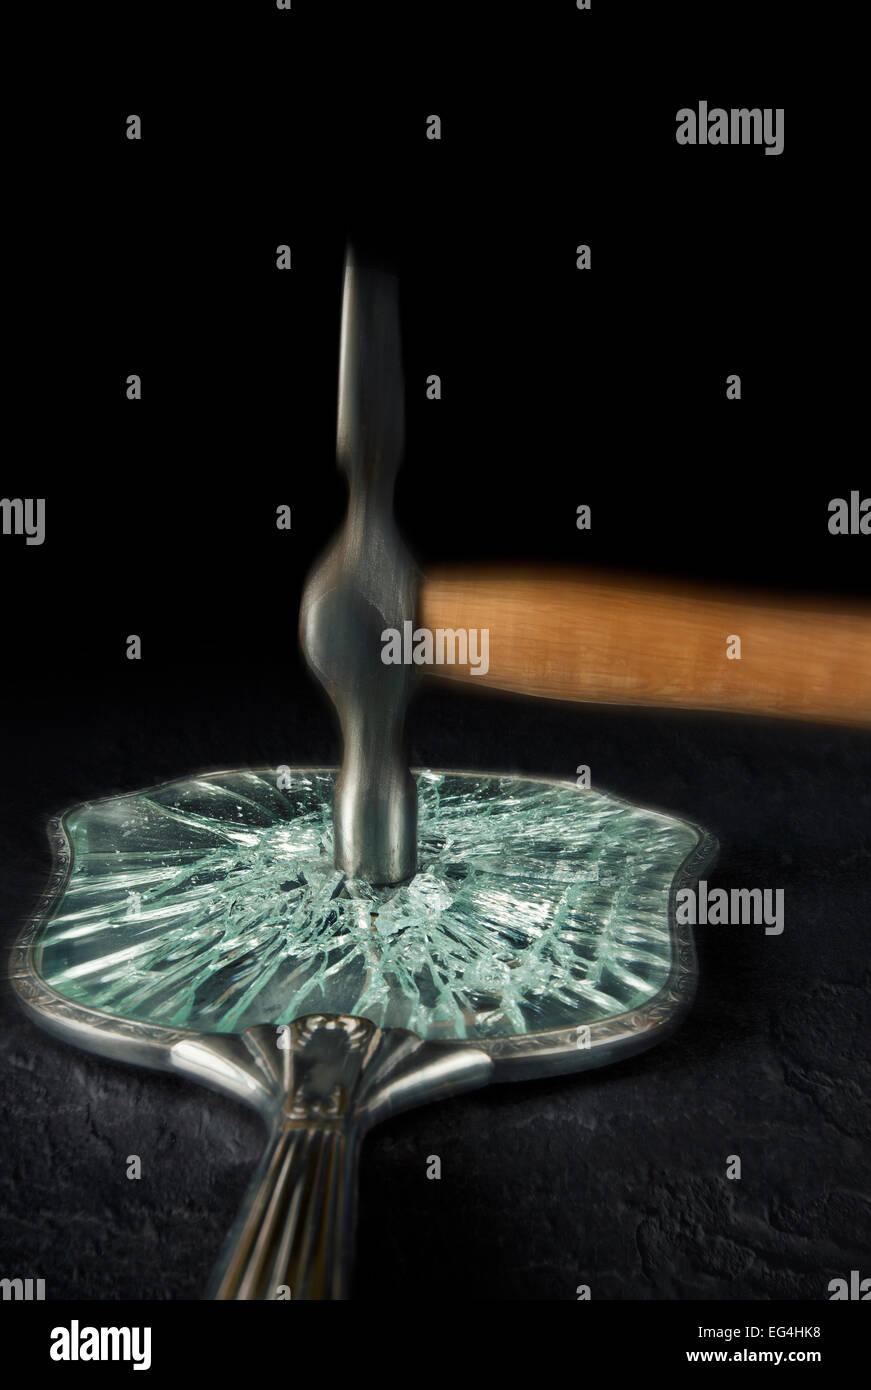 Hammer smashing a vanity mirror. - Stock Image